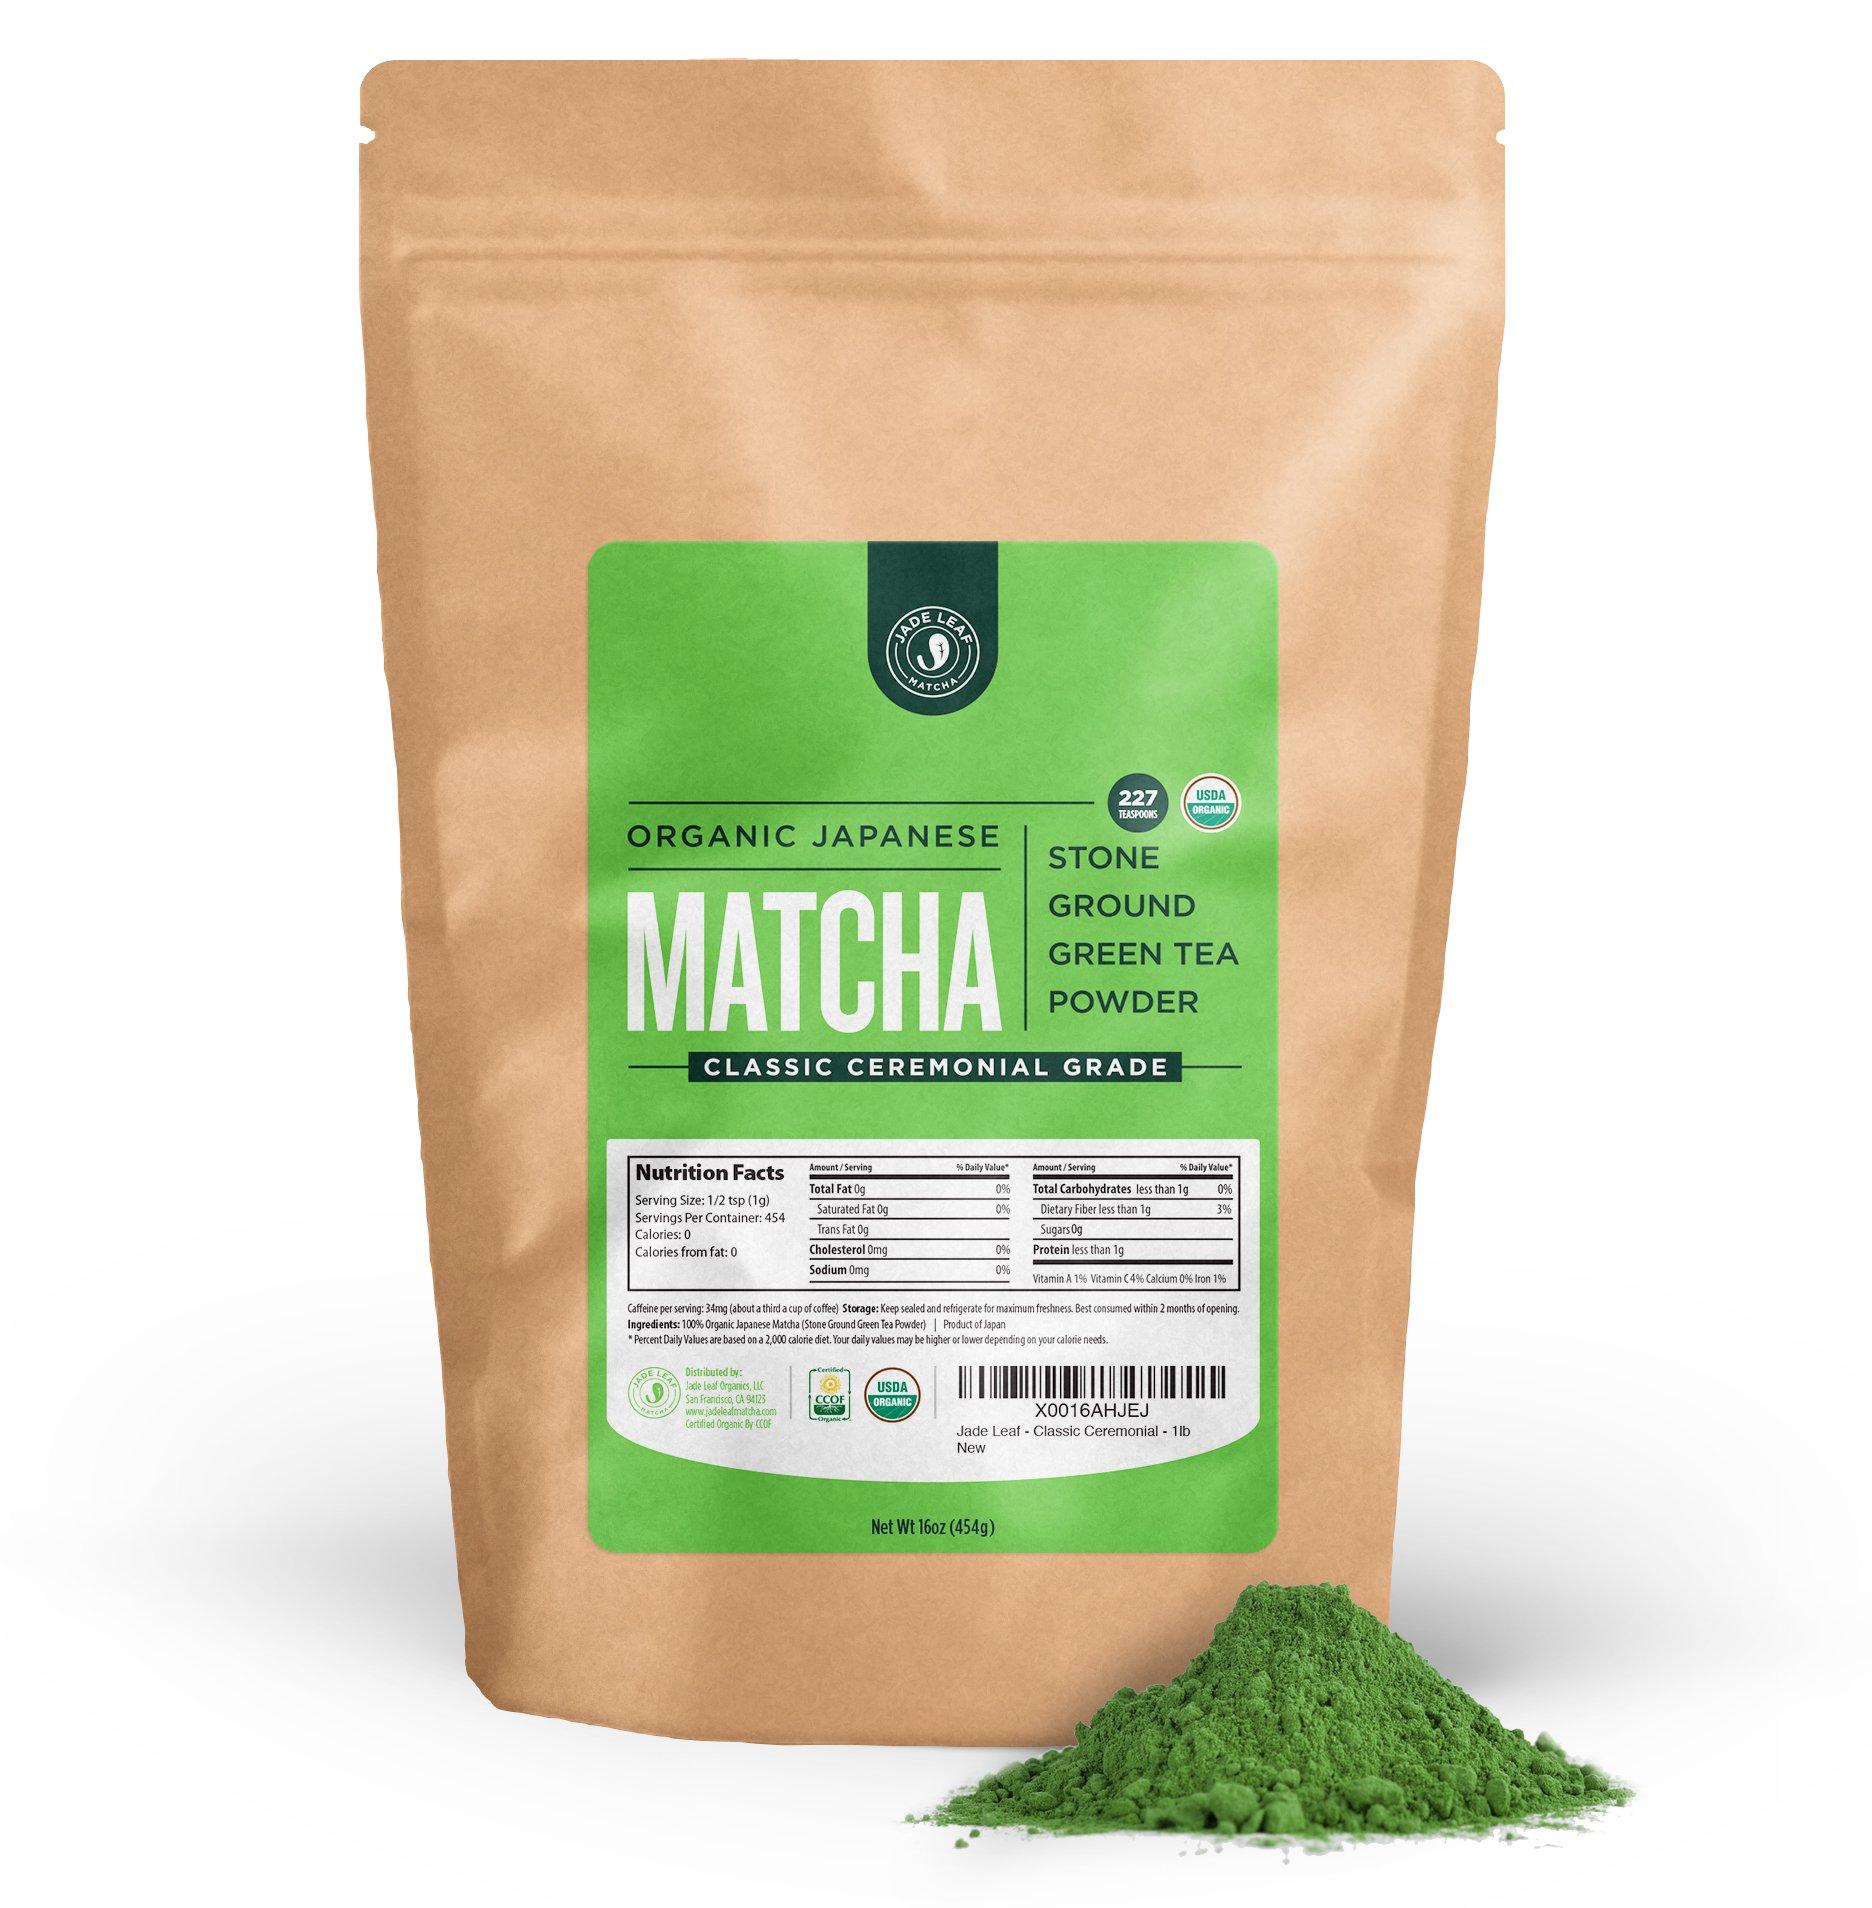 Jade Leaf Matcha Green Tea Powder - USDA Organic - Ceremonial Grade (For Sipping as Tea) - Authentic Japanese Origin - Antioxidants, Energy [1lb Bulk Size]